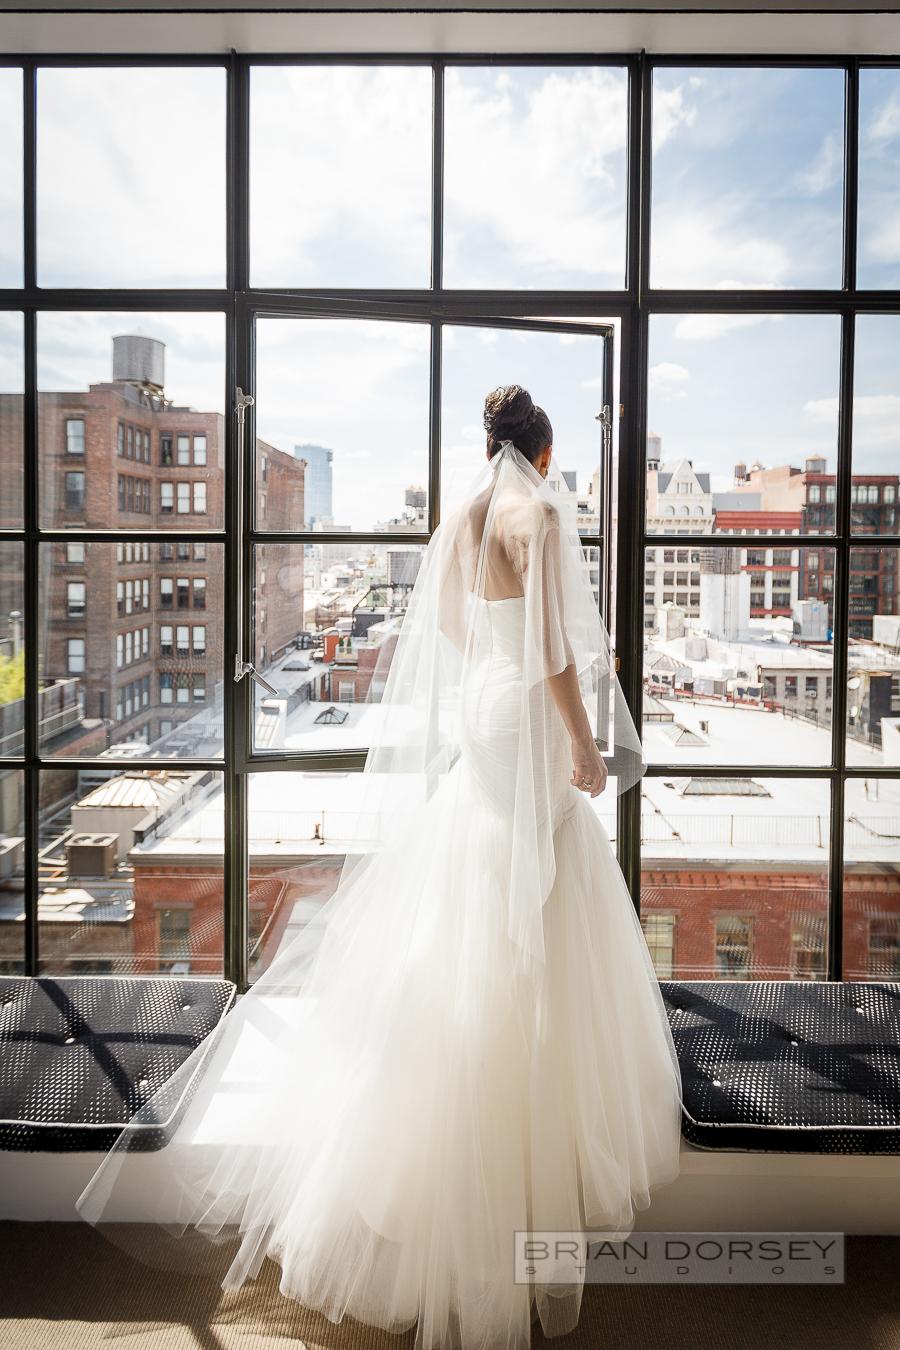 isola nomo soho hotel wedding brian dorsey studios ang weddings and events-10.jpg